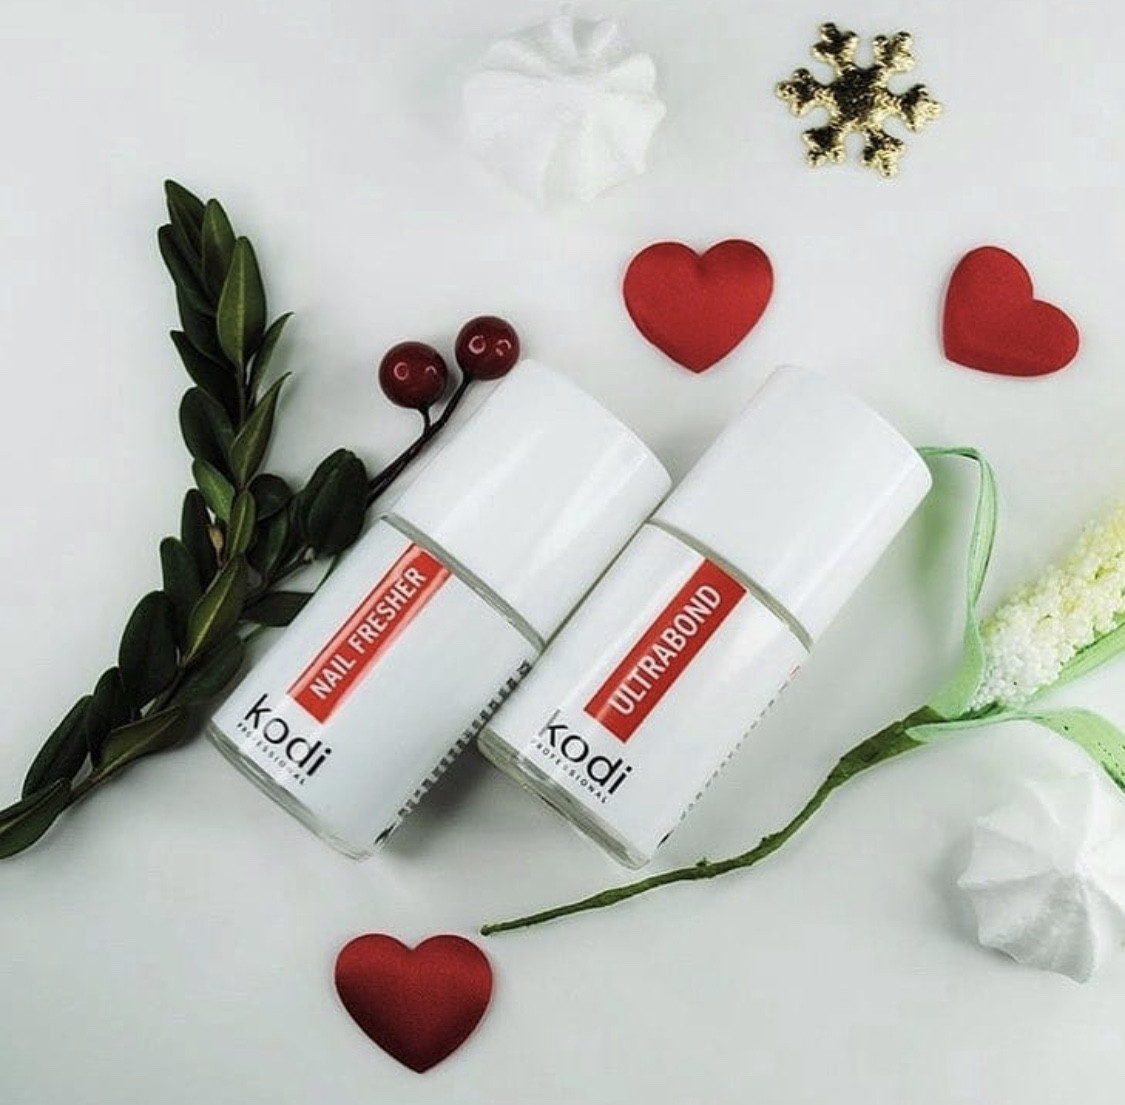 Обезжириватель для ногтей (дегидратор) Kodi Nail fresher 15 ml